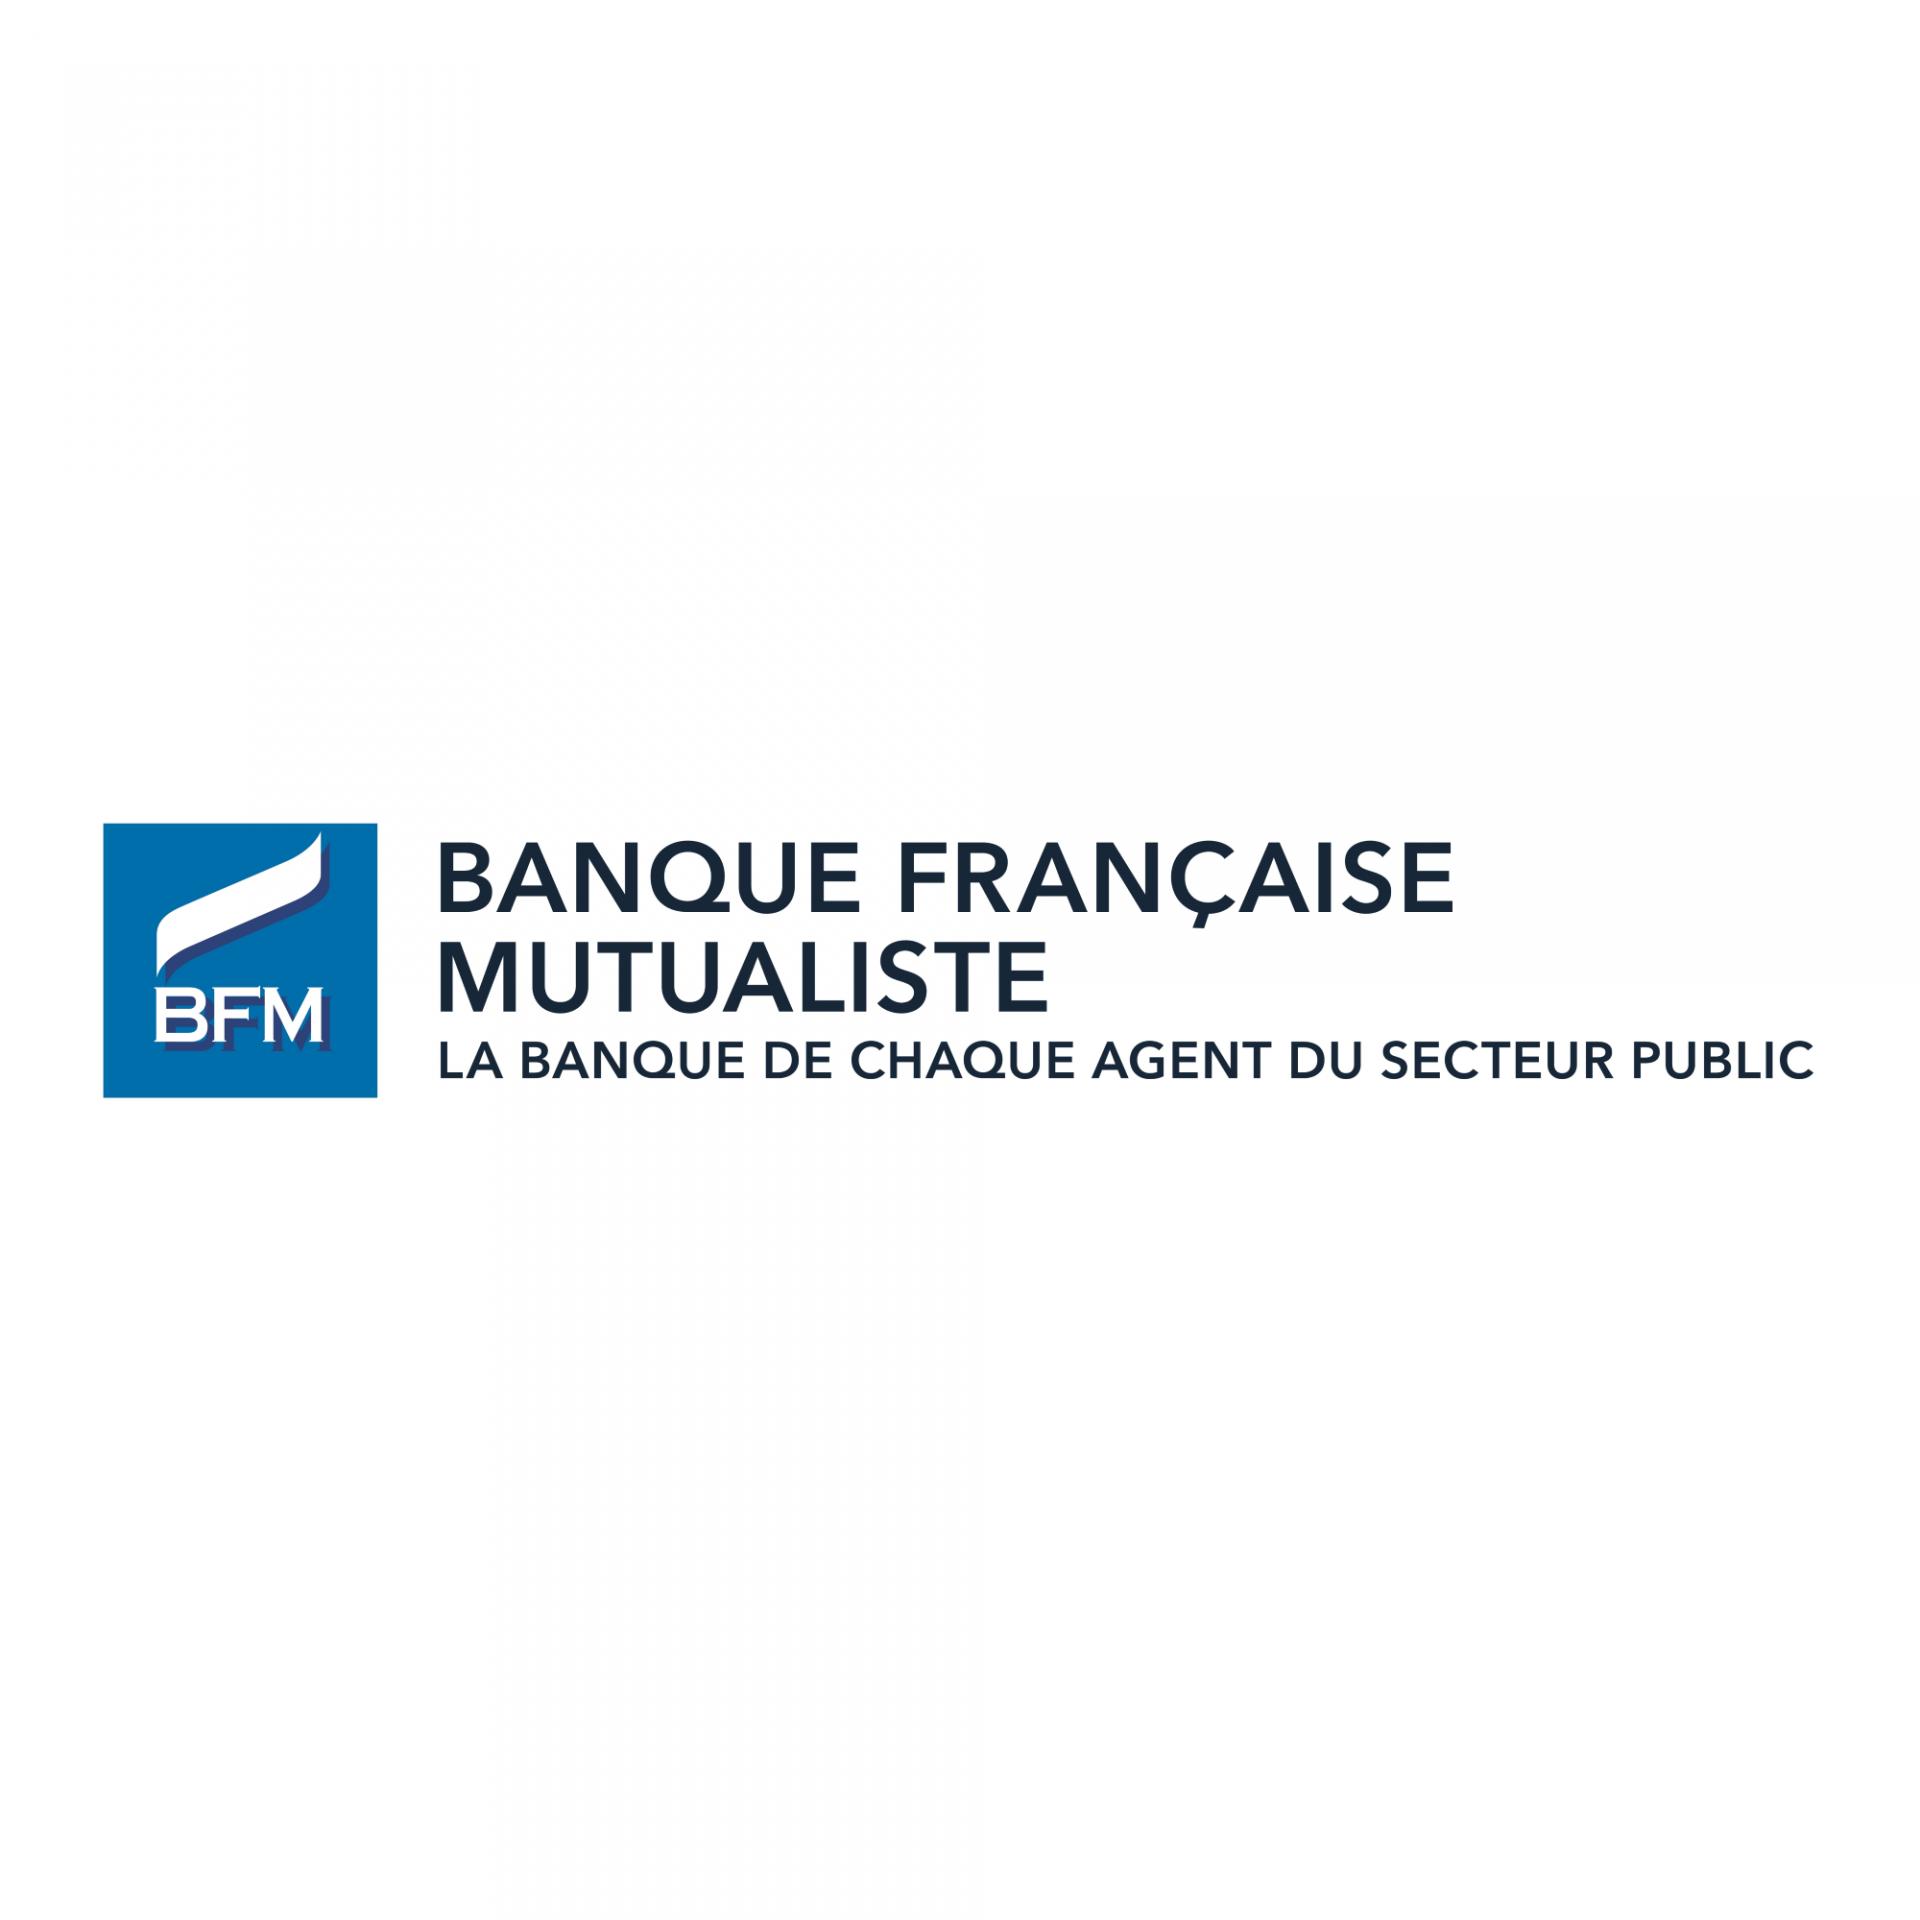 Logo bfm cmjn avec signat web 2000x2000